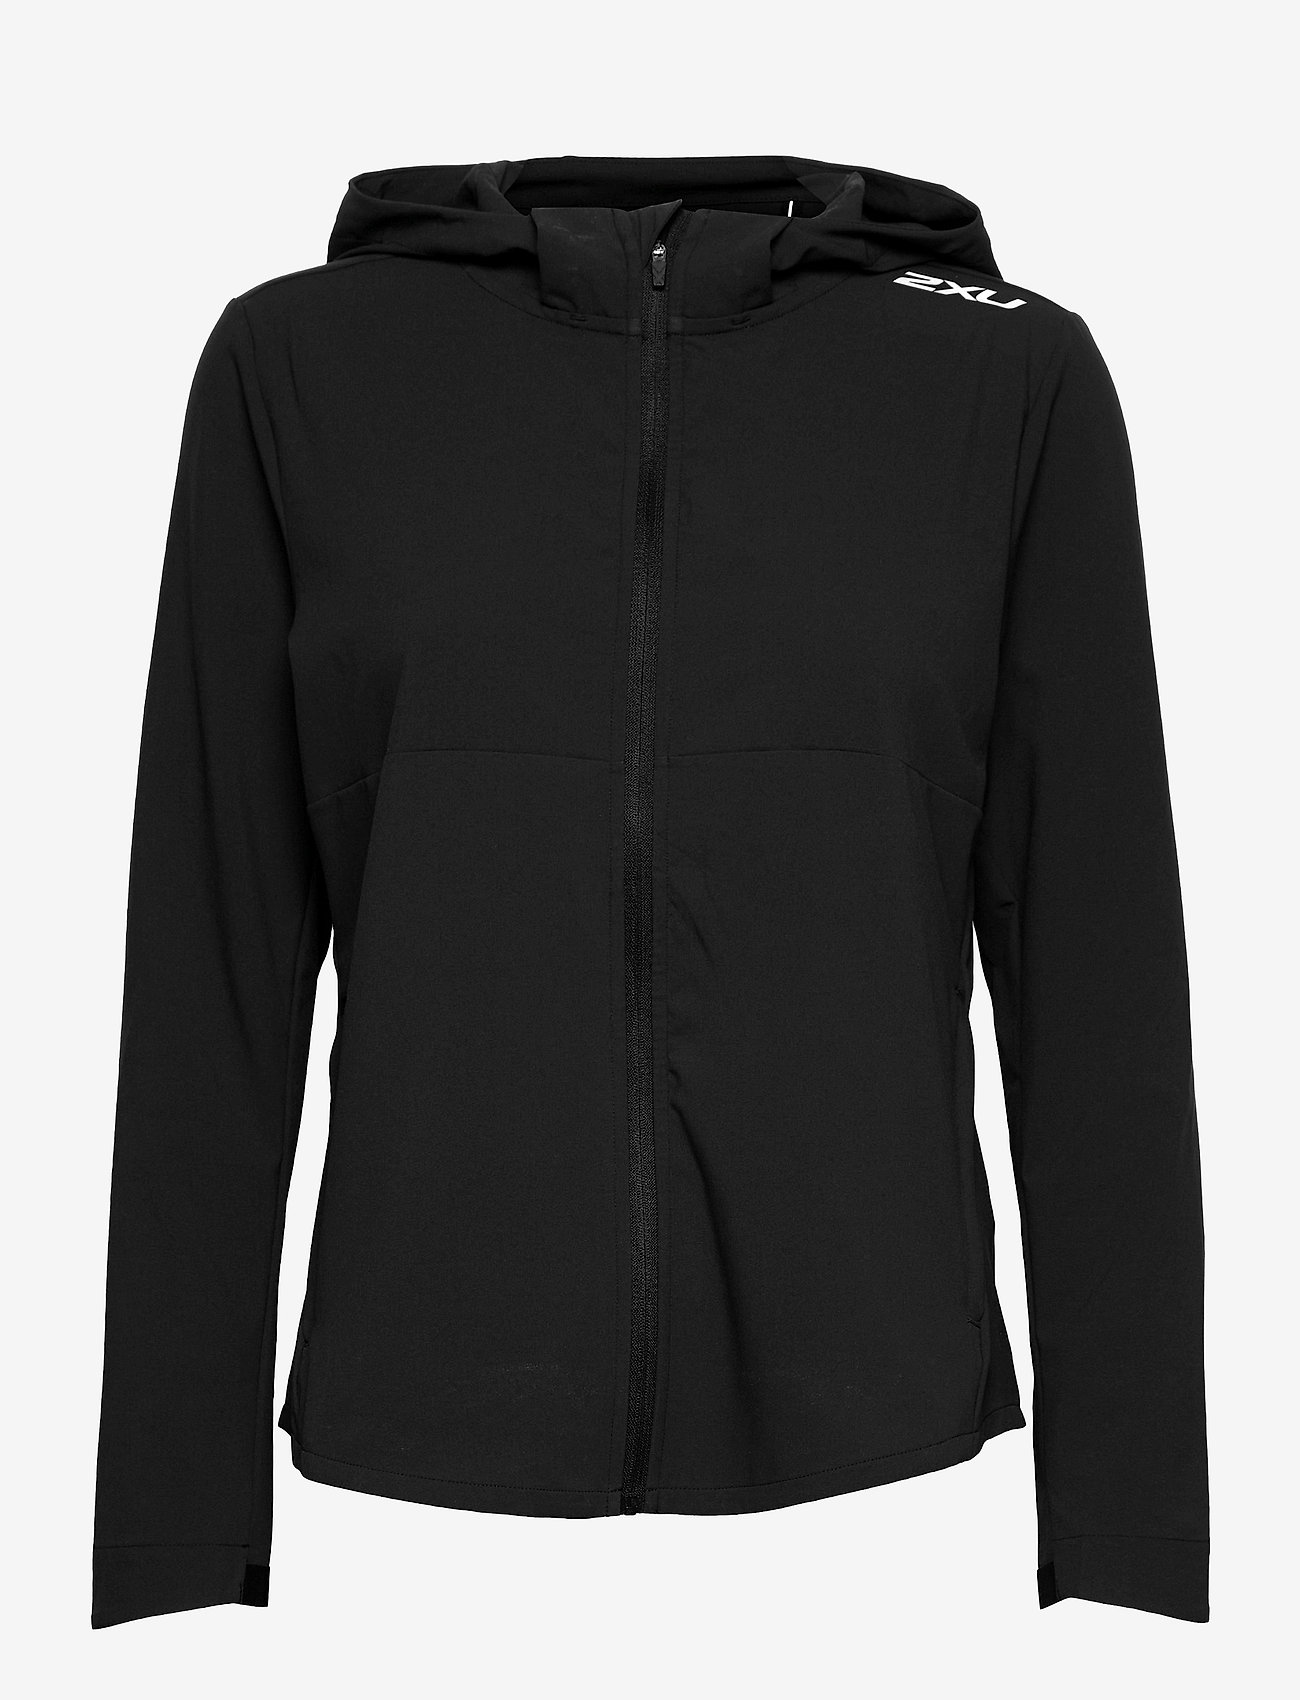 2XU - AERO JACKET - training jackets - black/silver reflective - 0